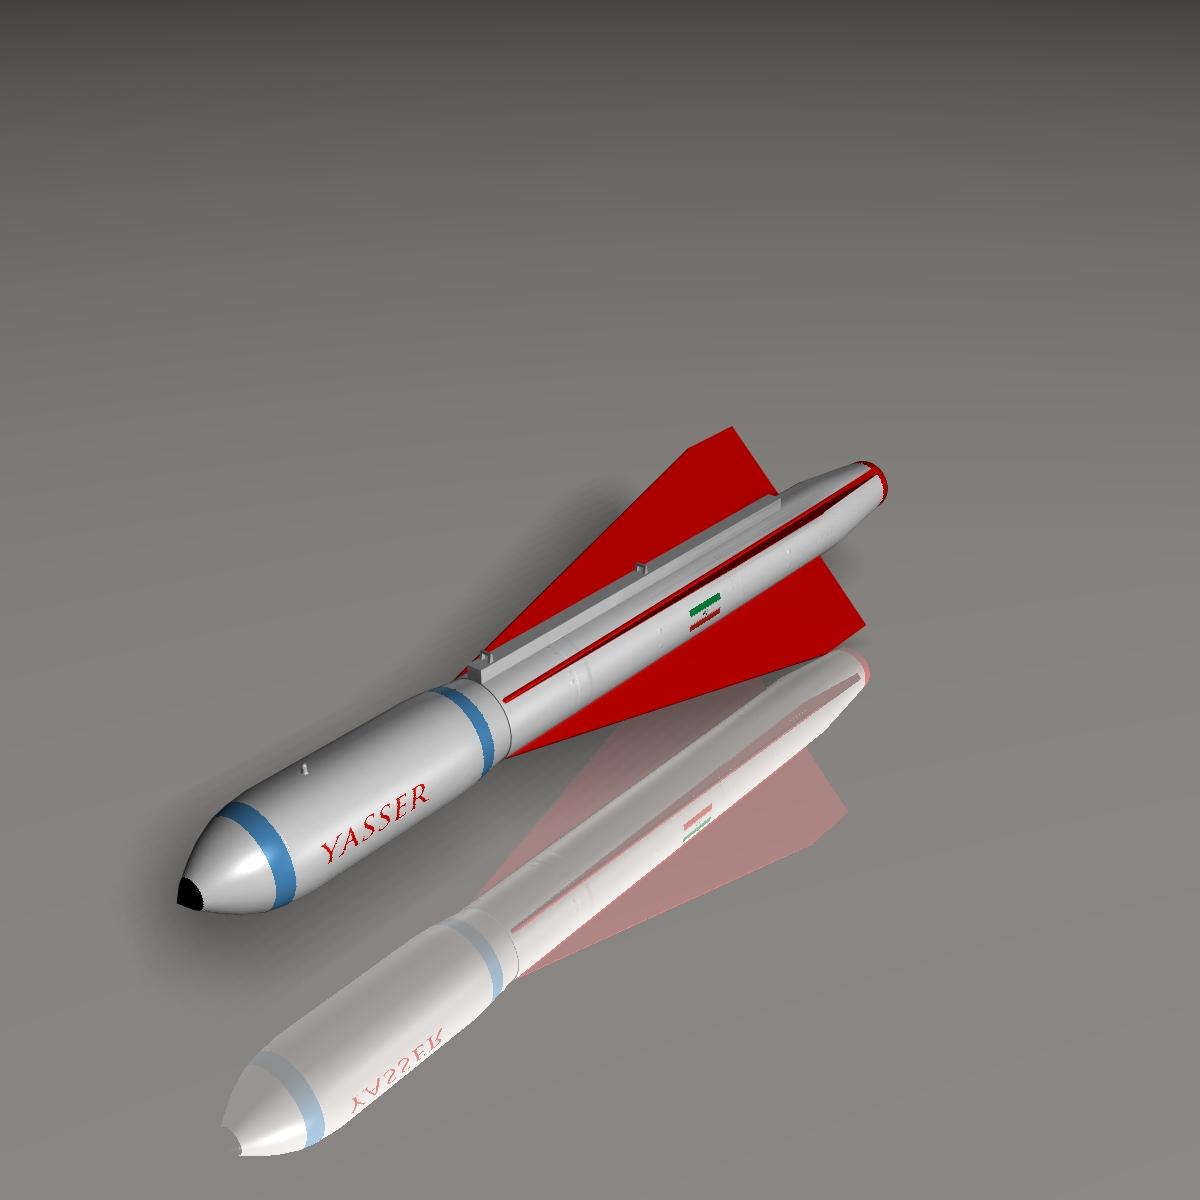 iran yasser asm raketi 3d modeli 3ds dxf cob x obj 150568